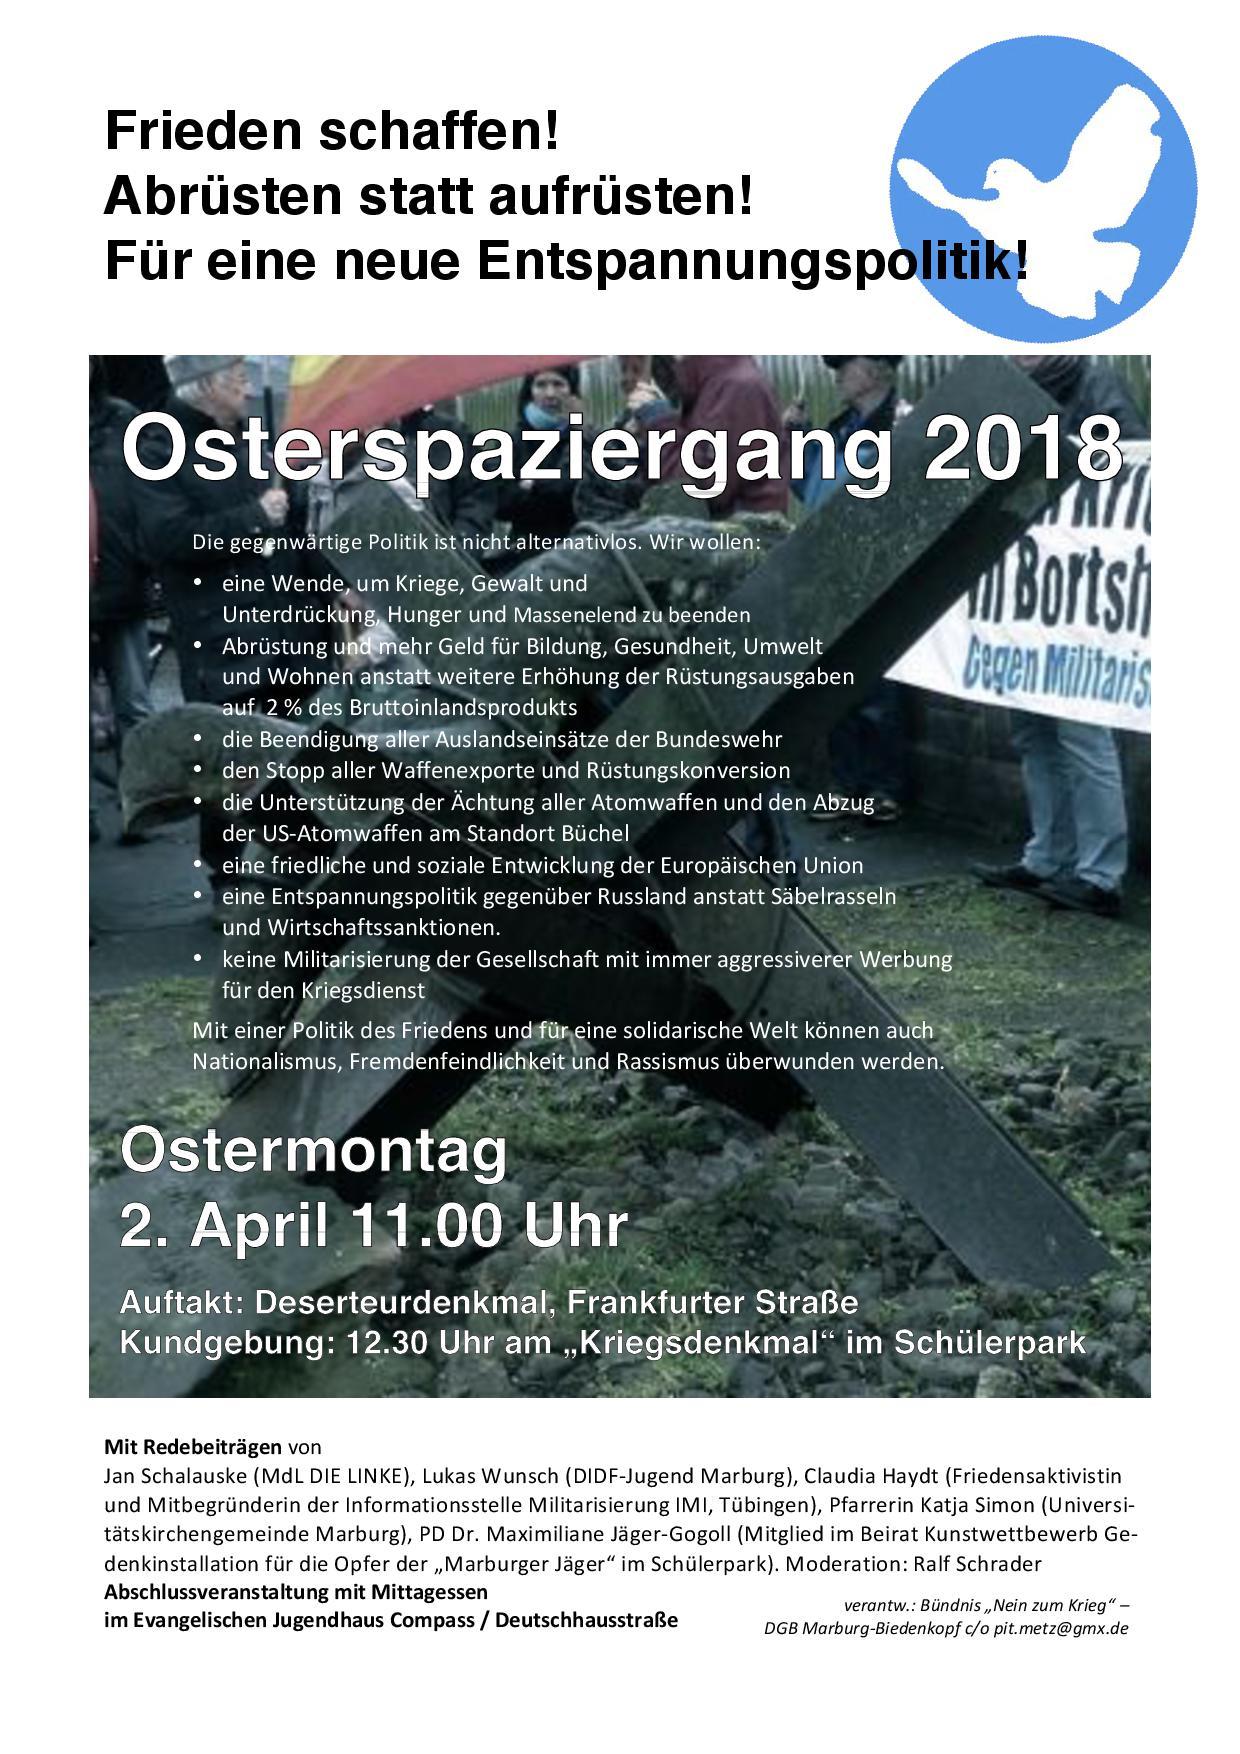 Osterspaziergang 2018 Plakat (3)